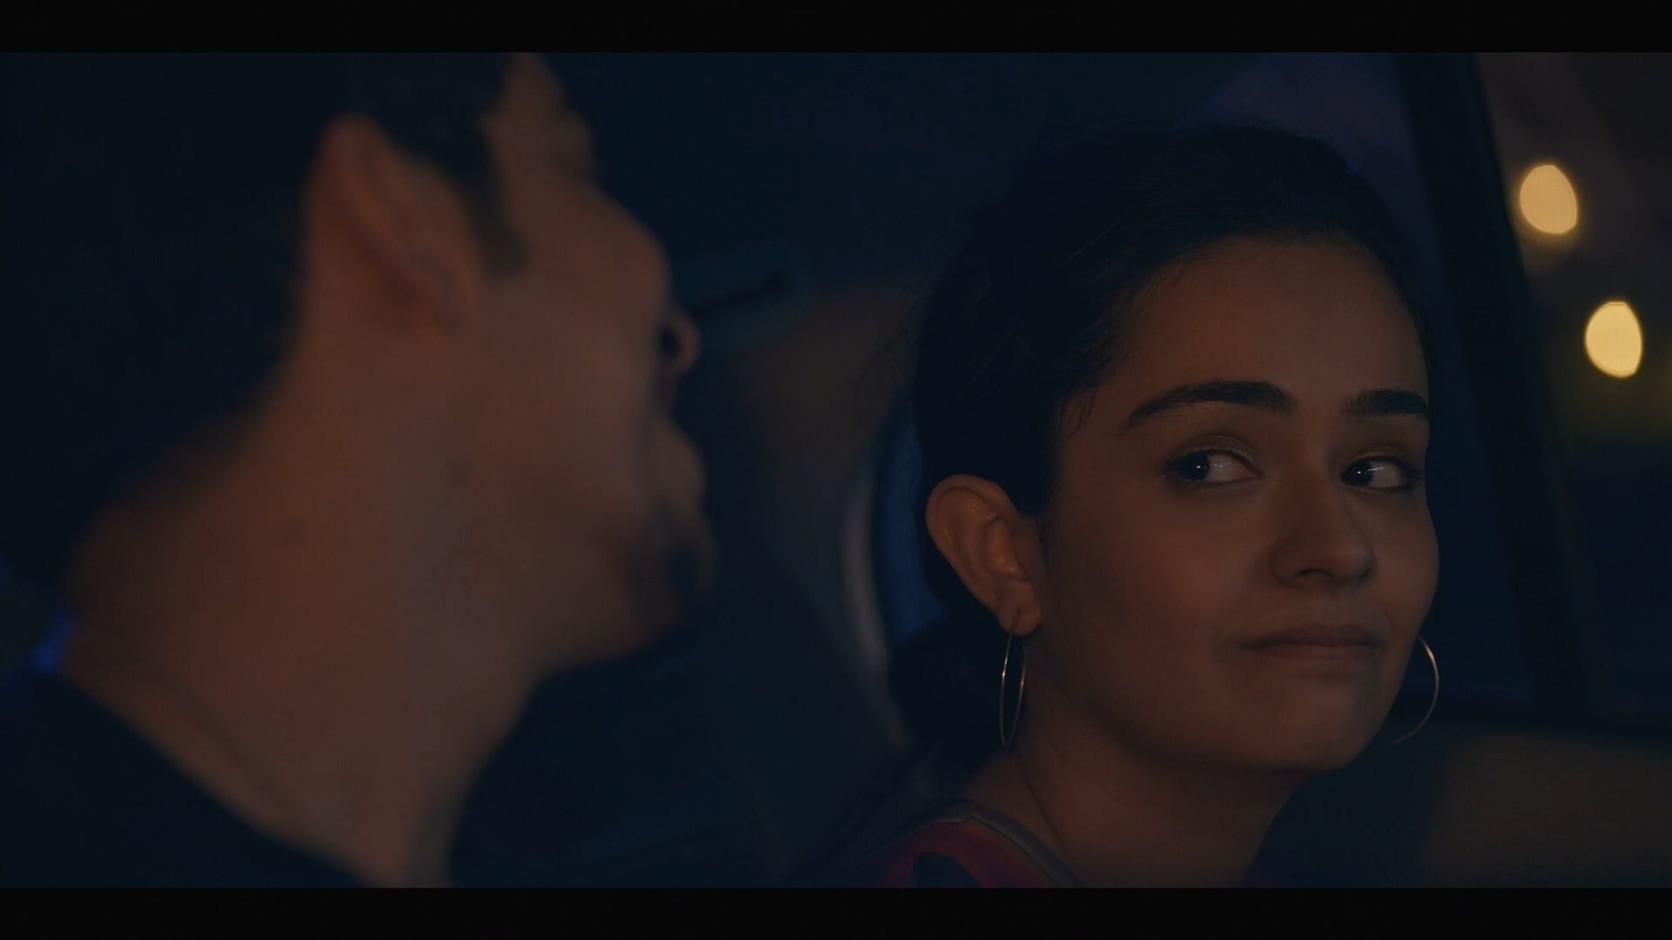 Download College Romance 2021 (Season 2) Hindi {Sony LIV Series} All Episodes WeB-DL